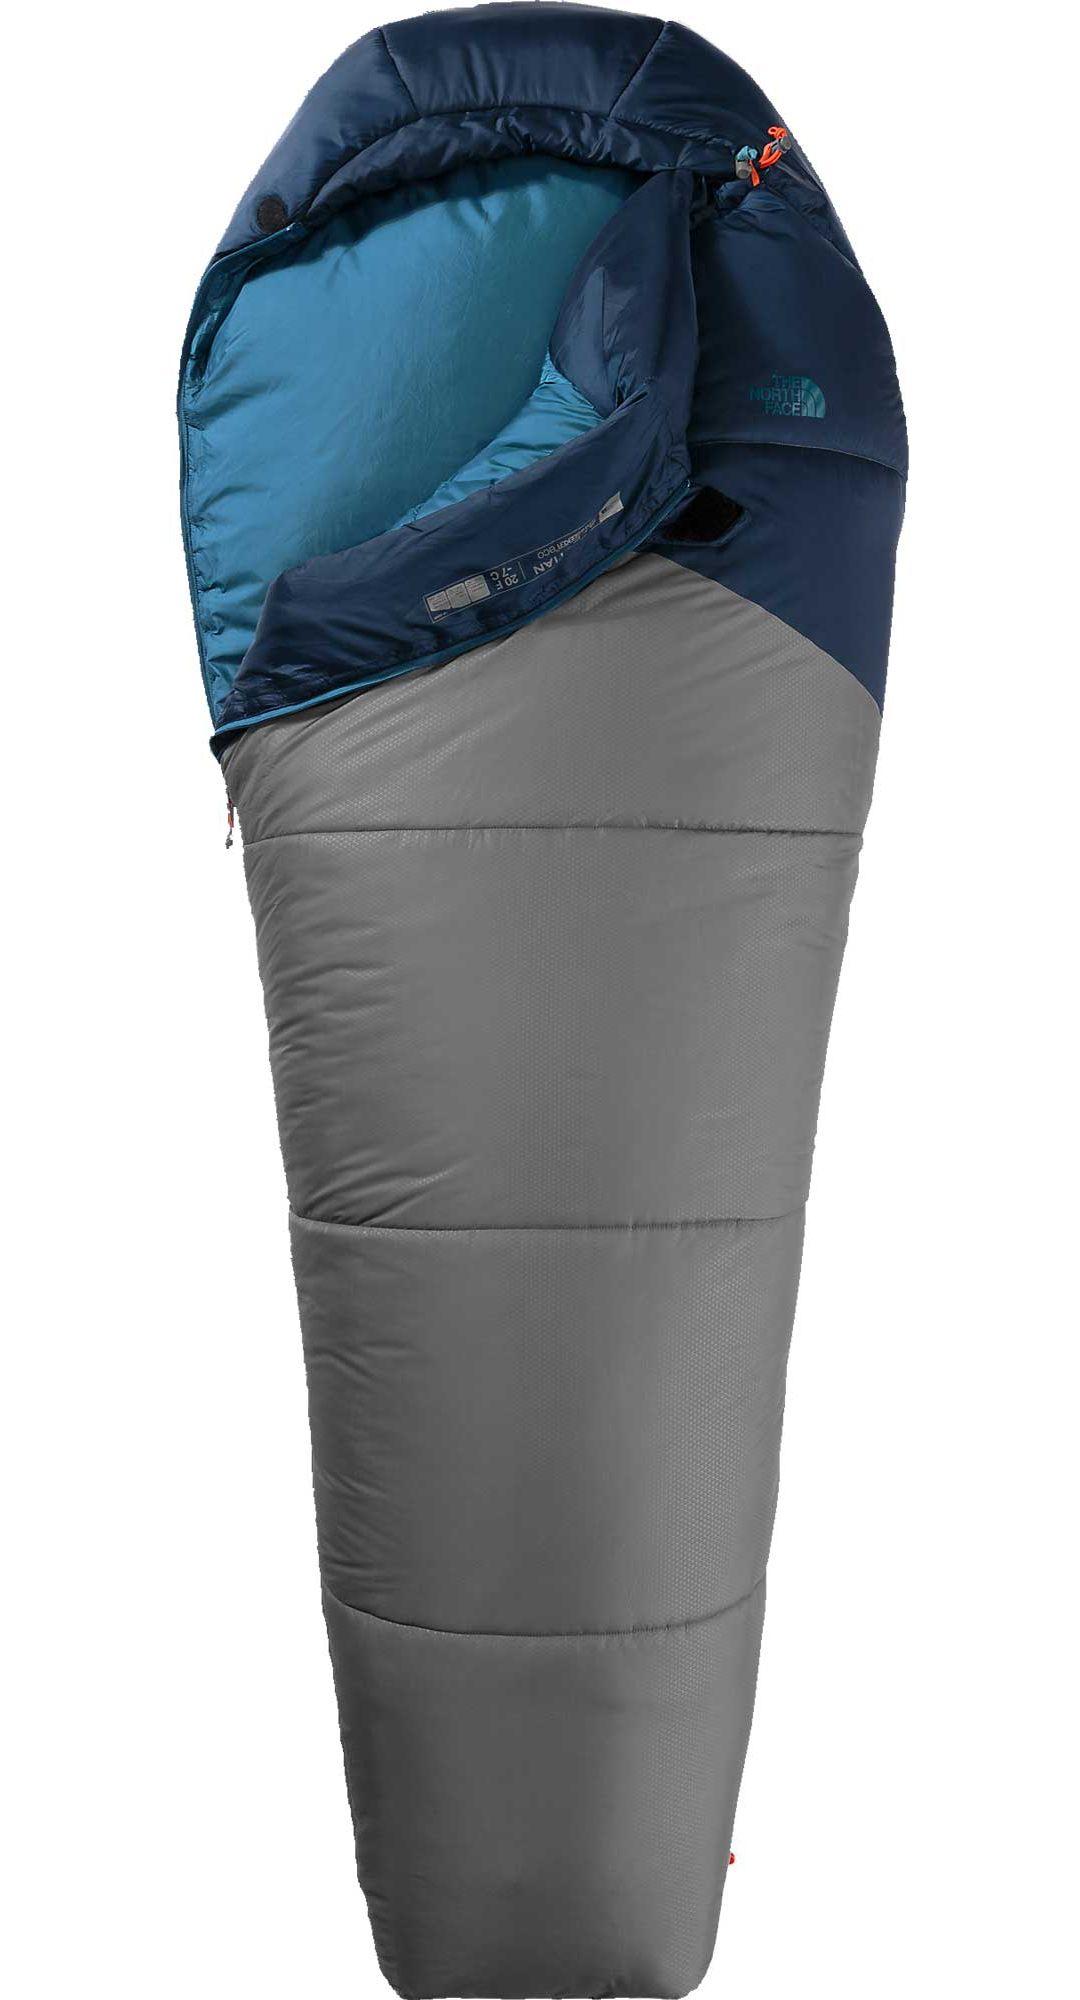 3b541b7cf The North Face Aleutian 20°F Sleeping Bag